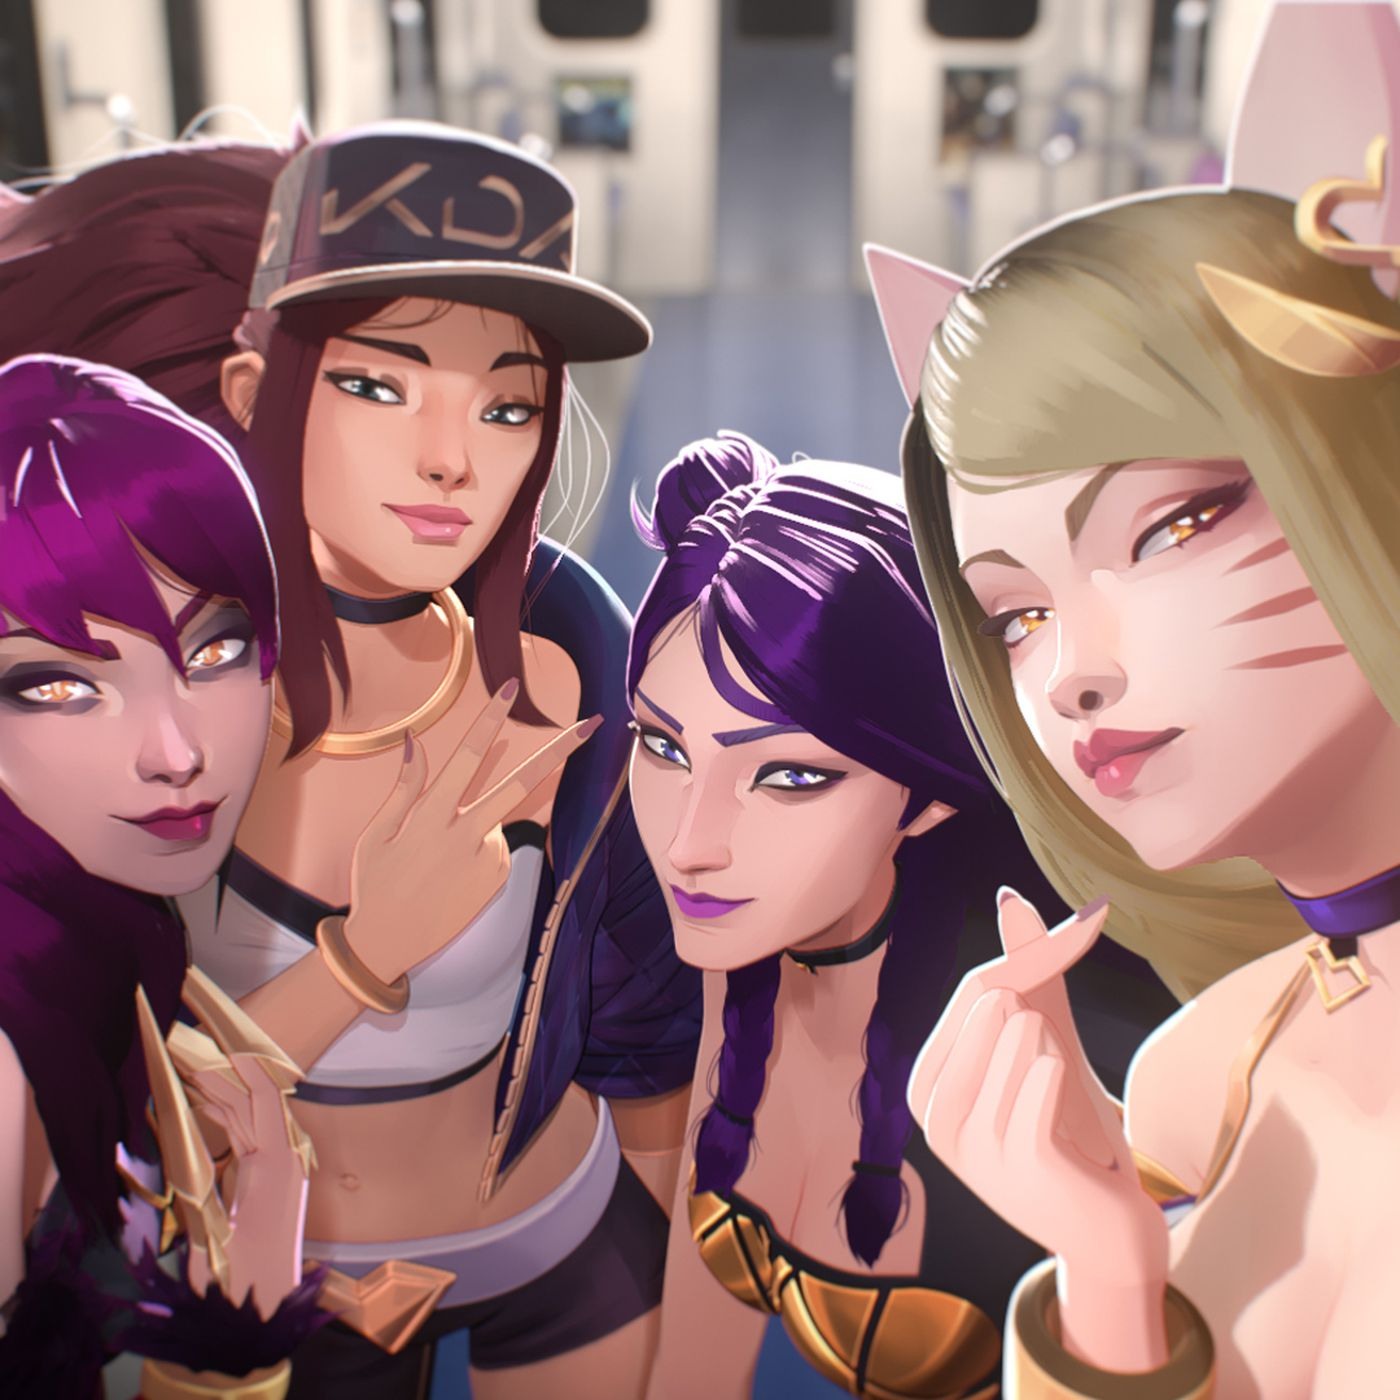 K/DA, League of Legends' pop girl group, explained - Polygon